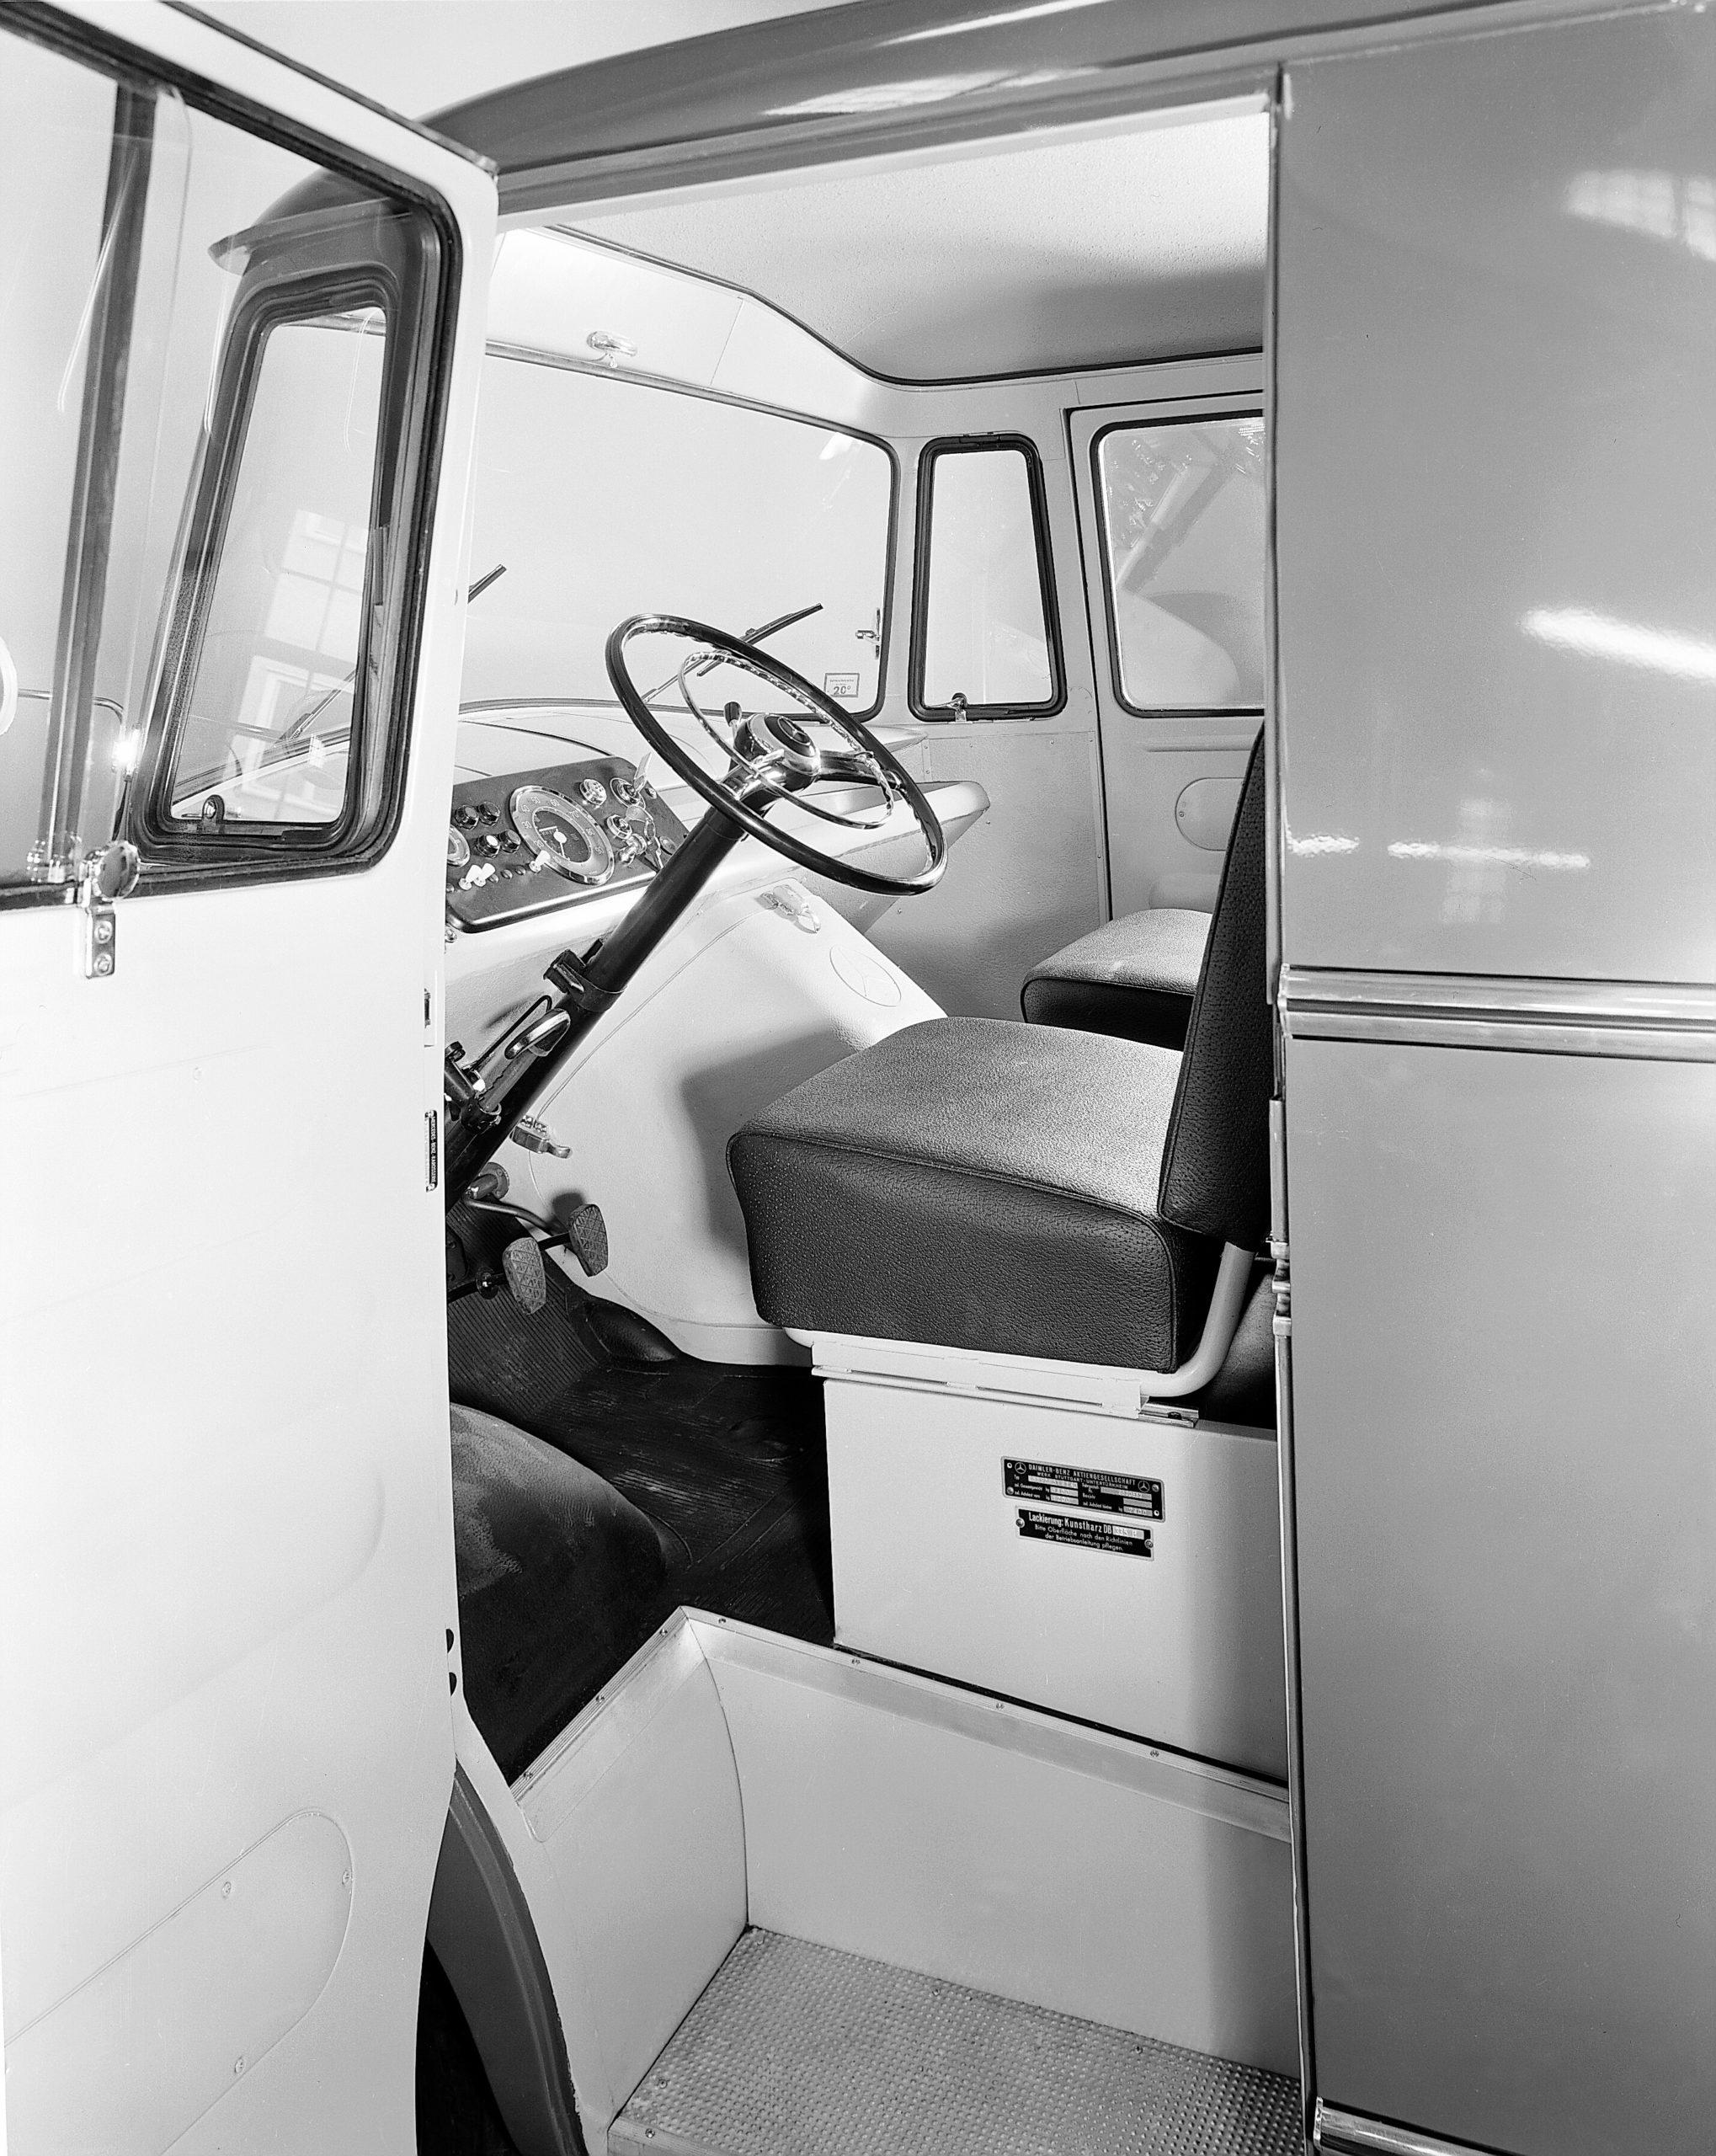 Mercedes-Benz L 319 / L 319 D panel van with conventional door